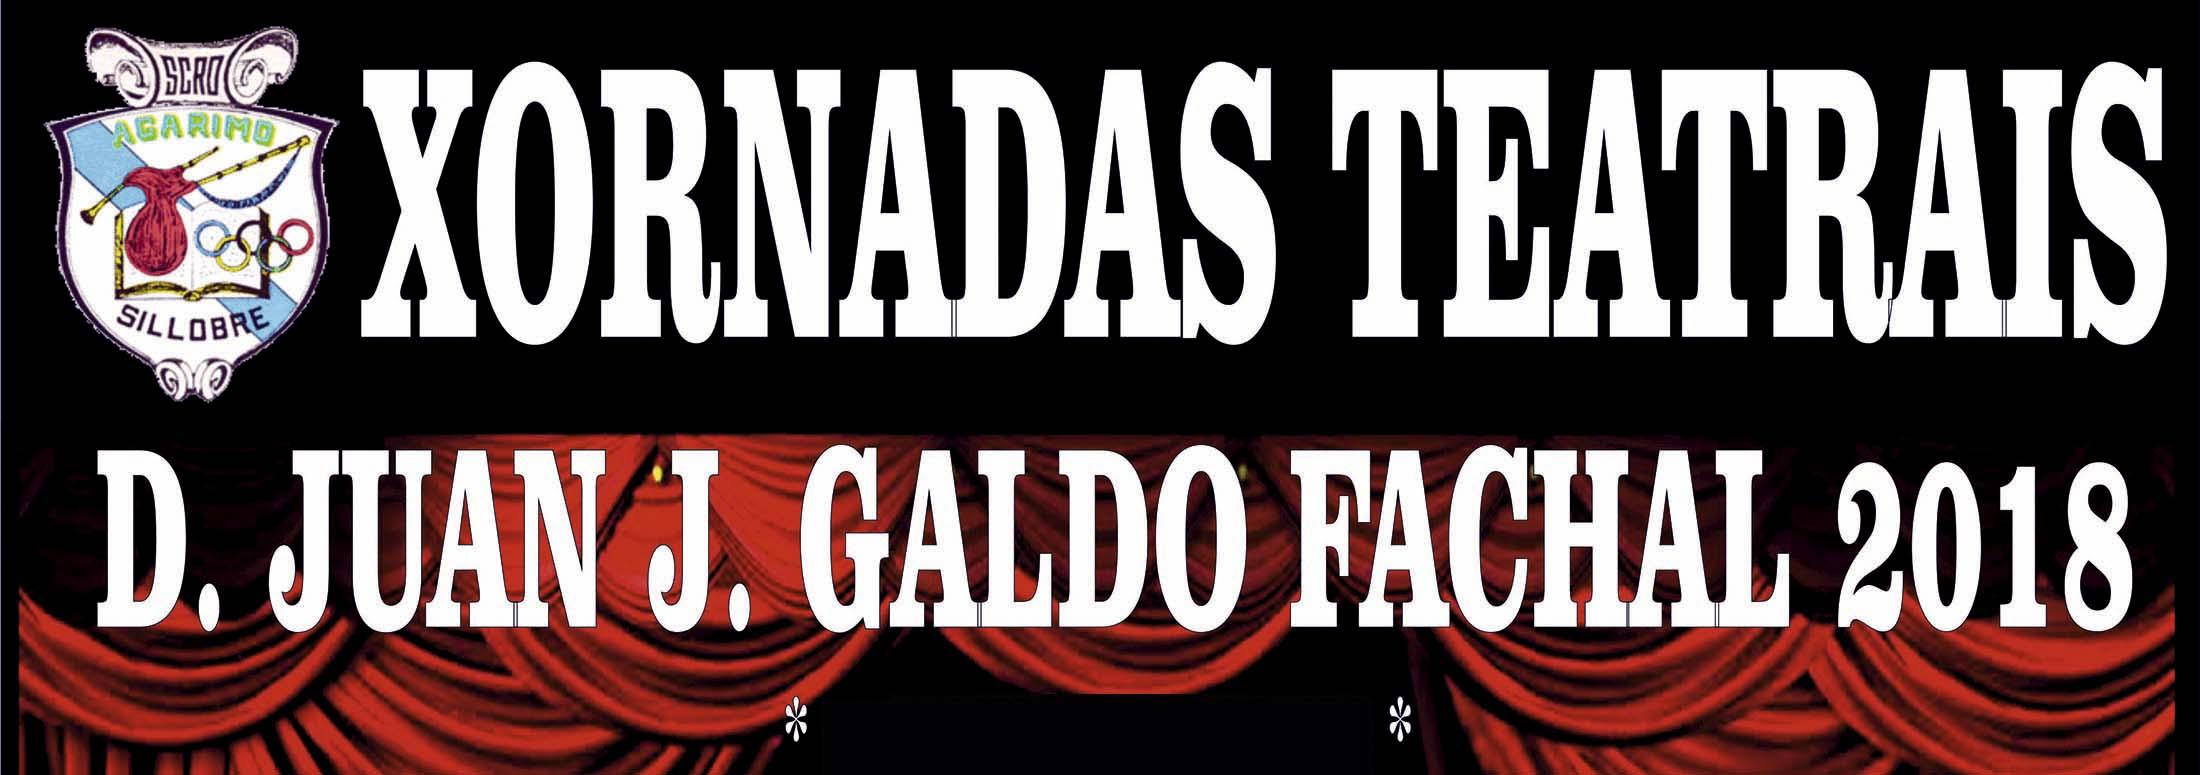 Xornadas teatrais D.Juan J. Galdo Fachal 2018